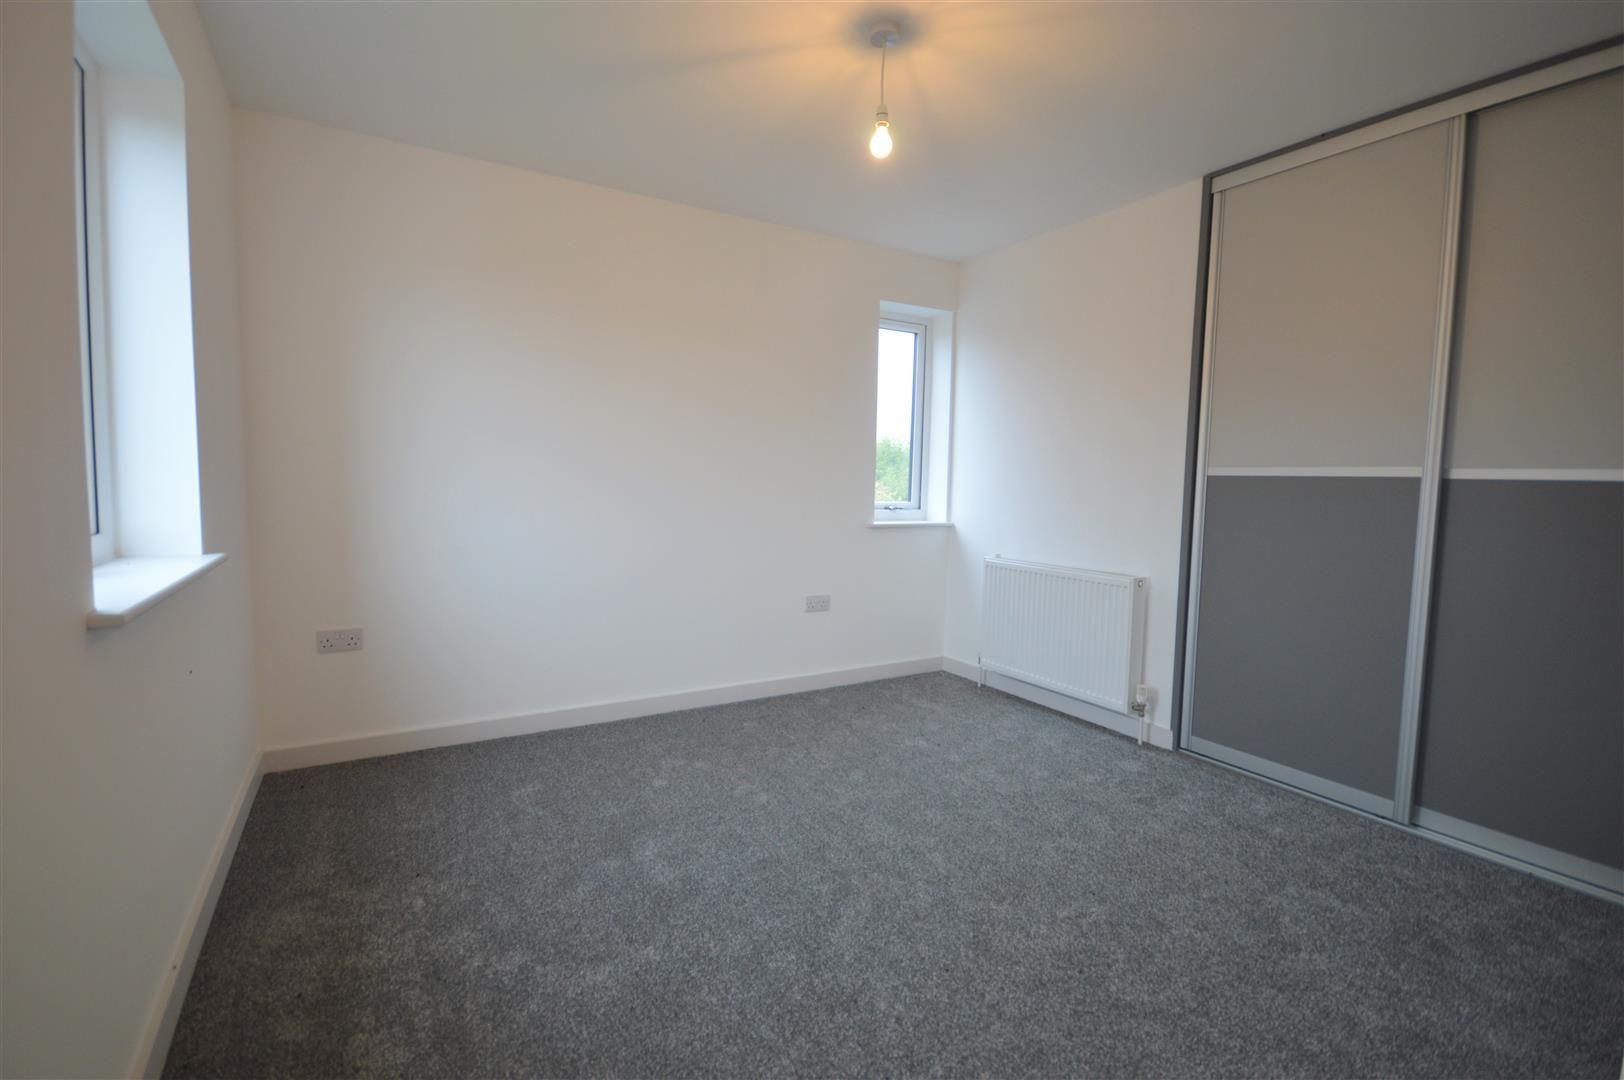 2 bed detached for sale in Leominster  - Property Image 8